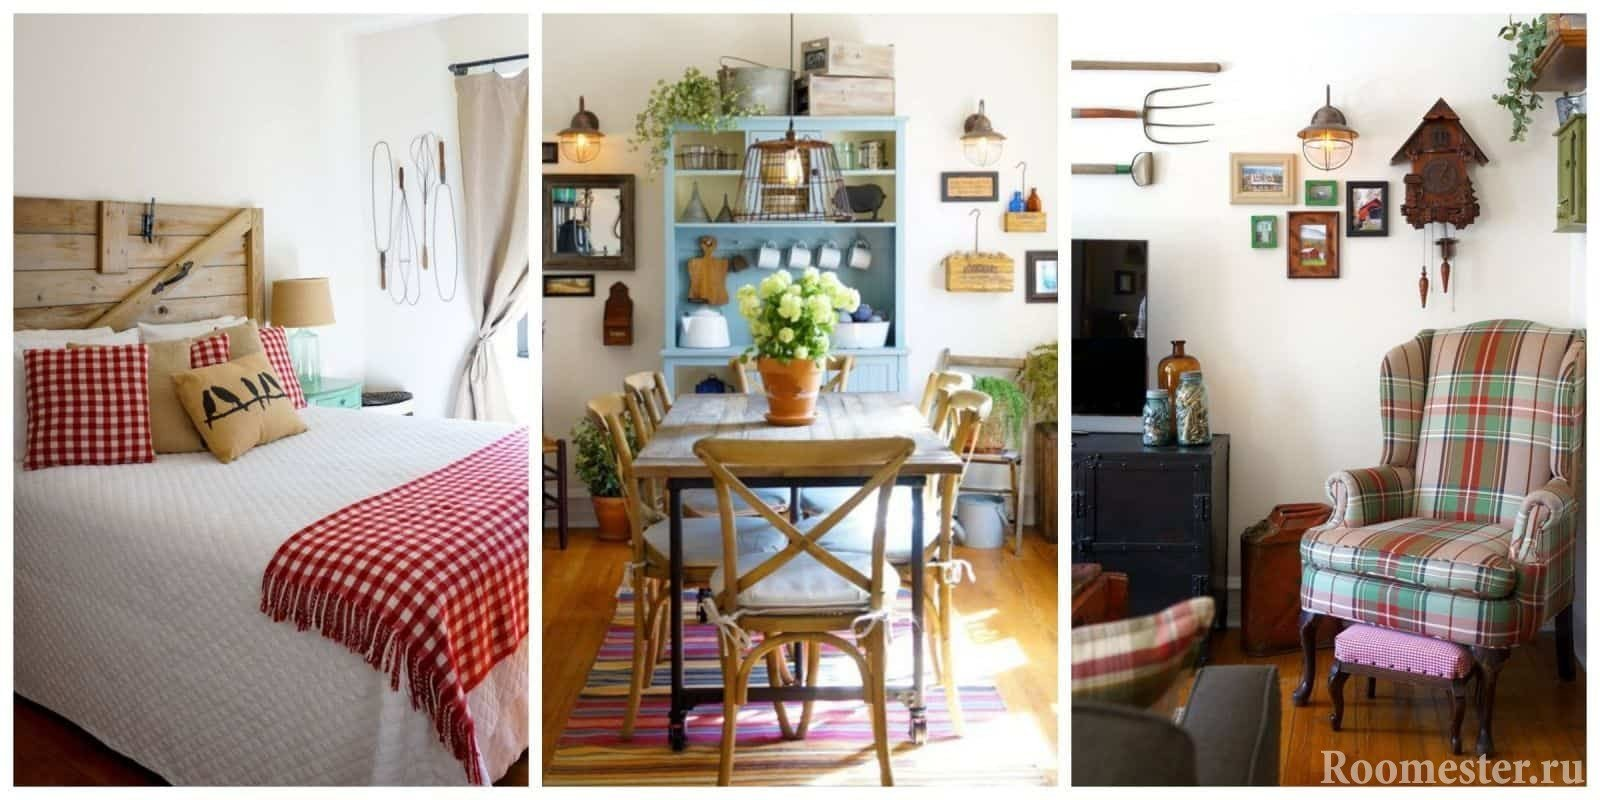 Kitchen Cabinet Displays For Sale Стиль кантри в интерьере дома и квартиры примеры дизайна